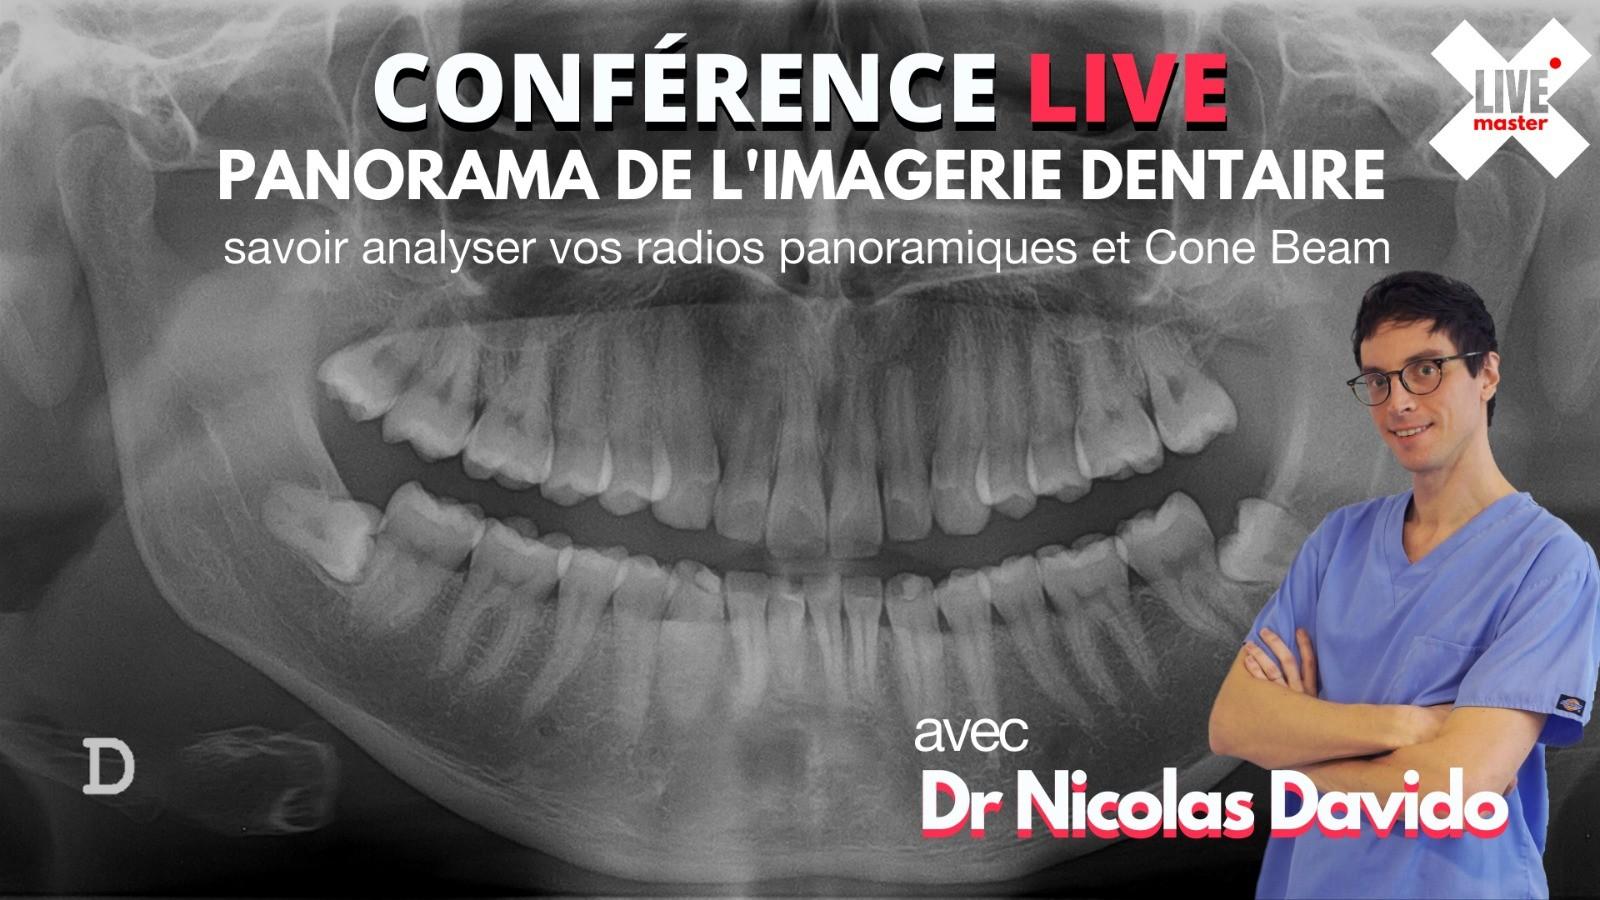 Panorama de l'imagerie dentaire